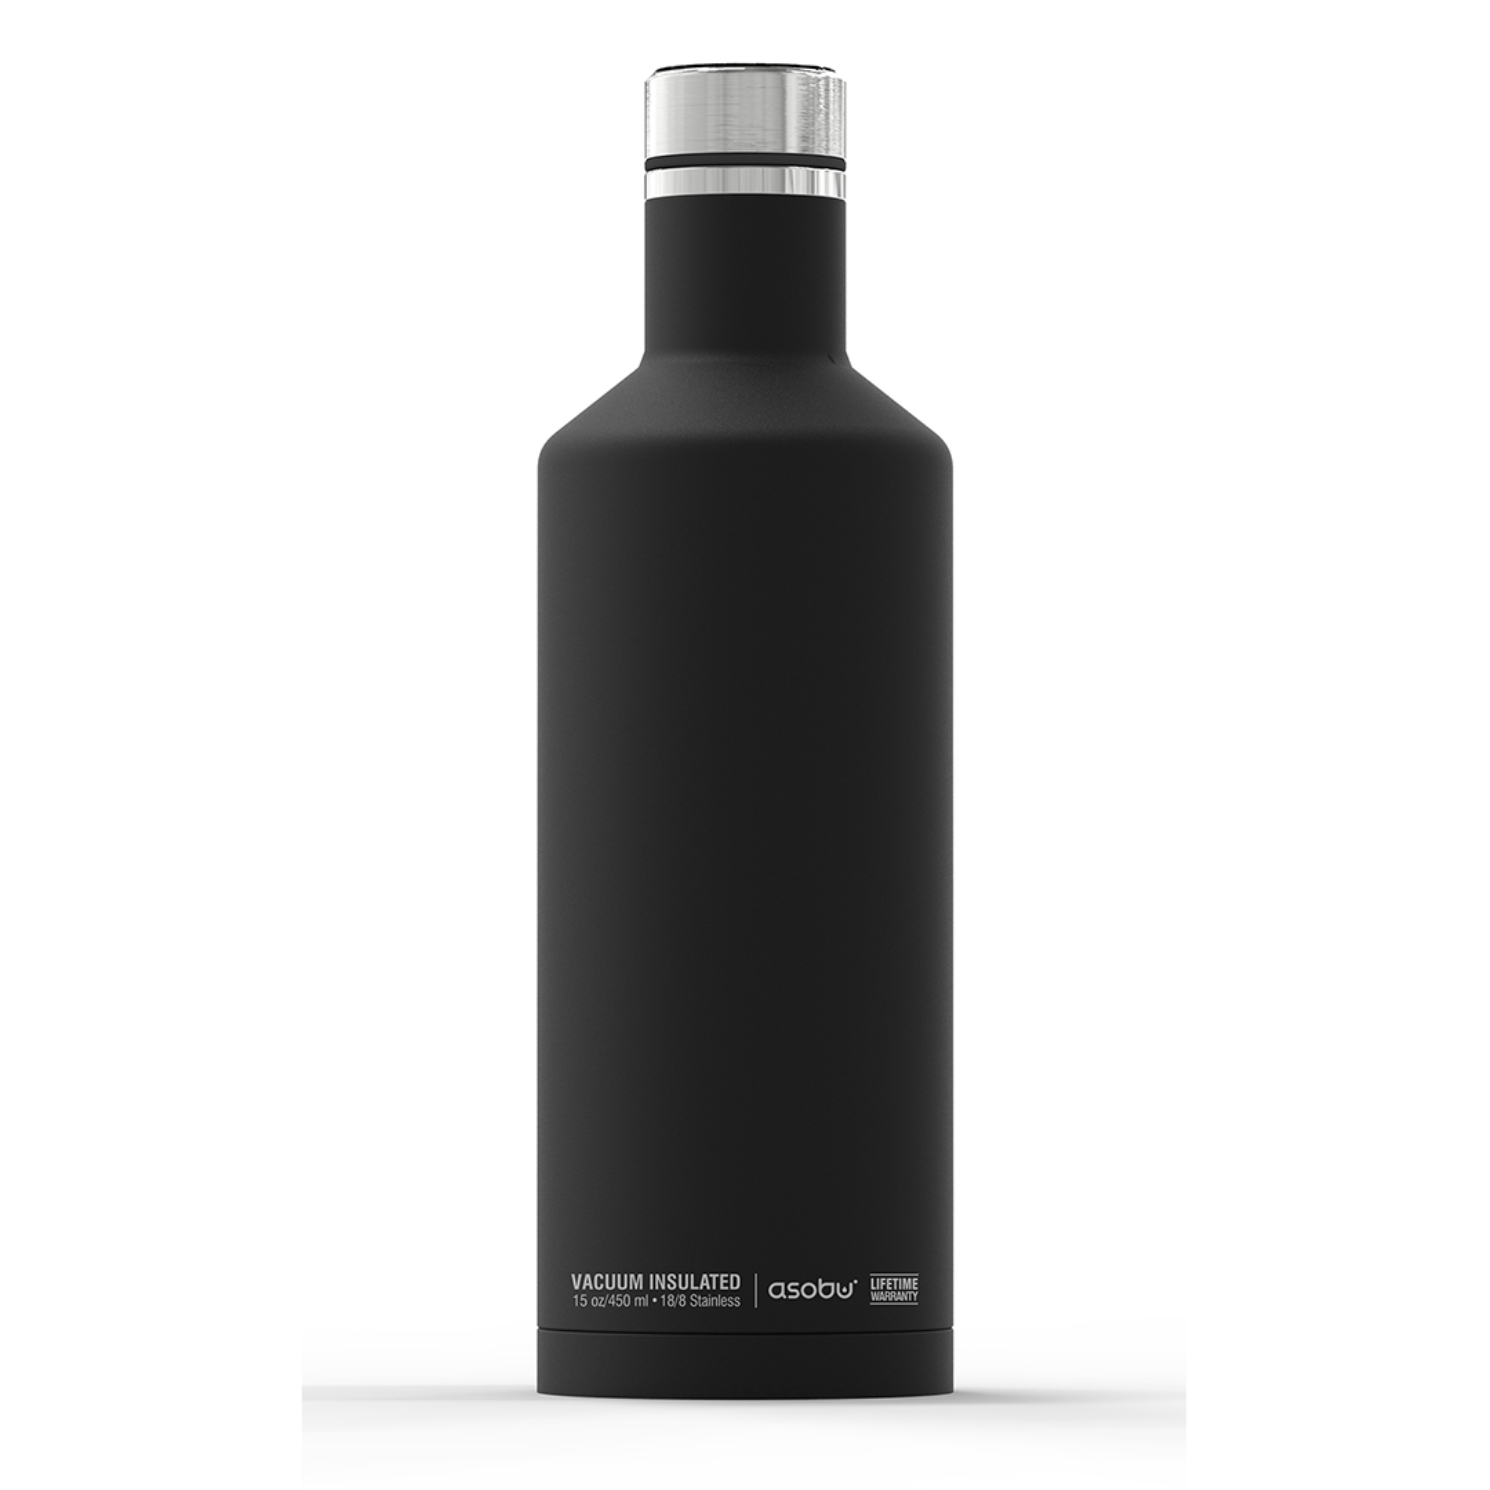 Онлайн каталог PROMENU: Термобутылка Asobu TIMES SQUARE, 0,45 л, черный                                   SBV15 BLACK